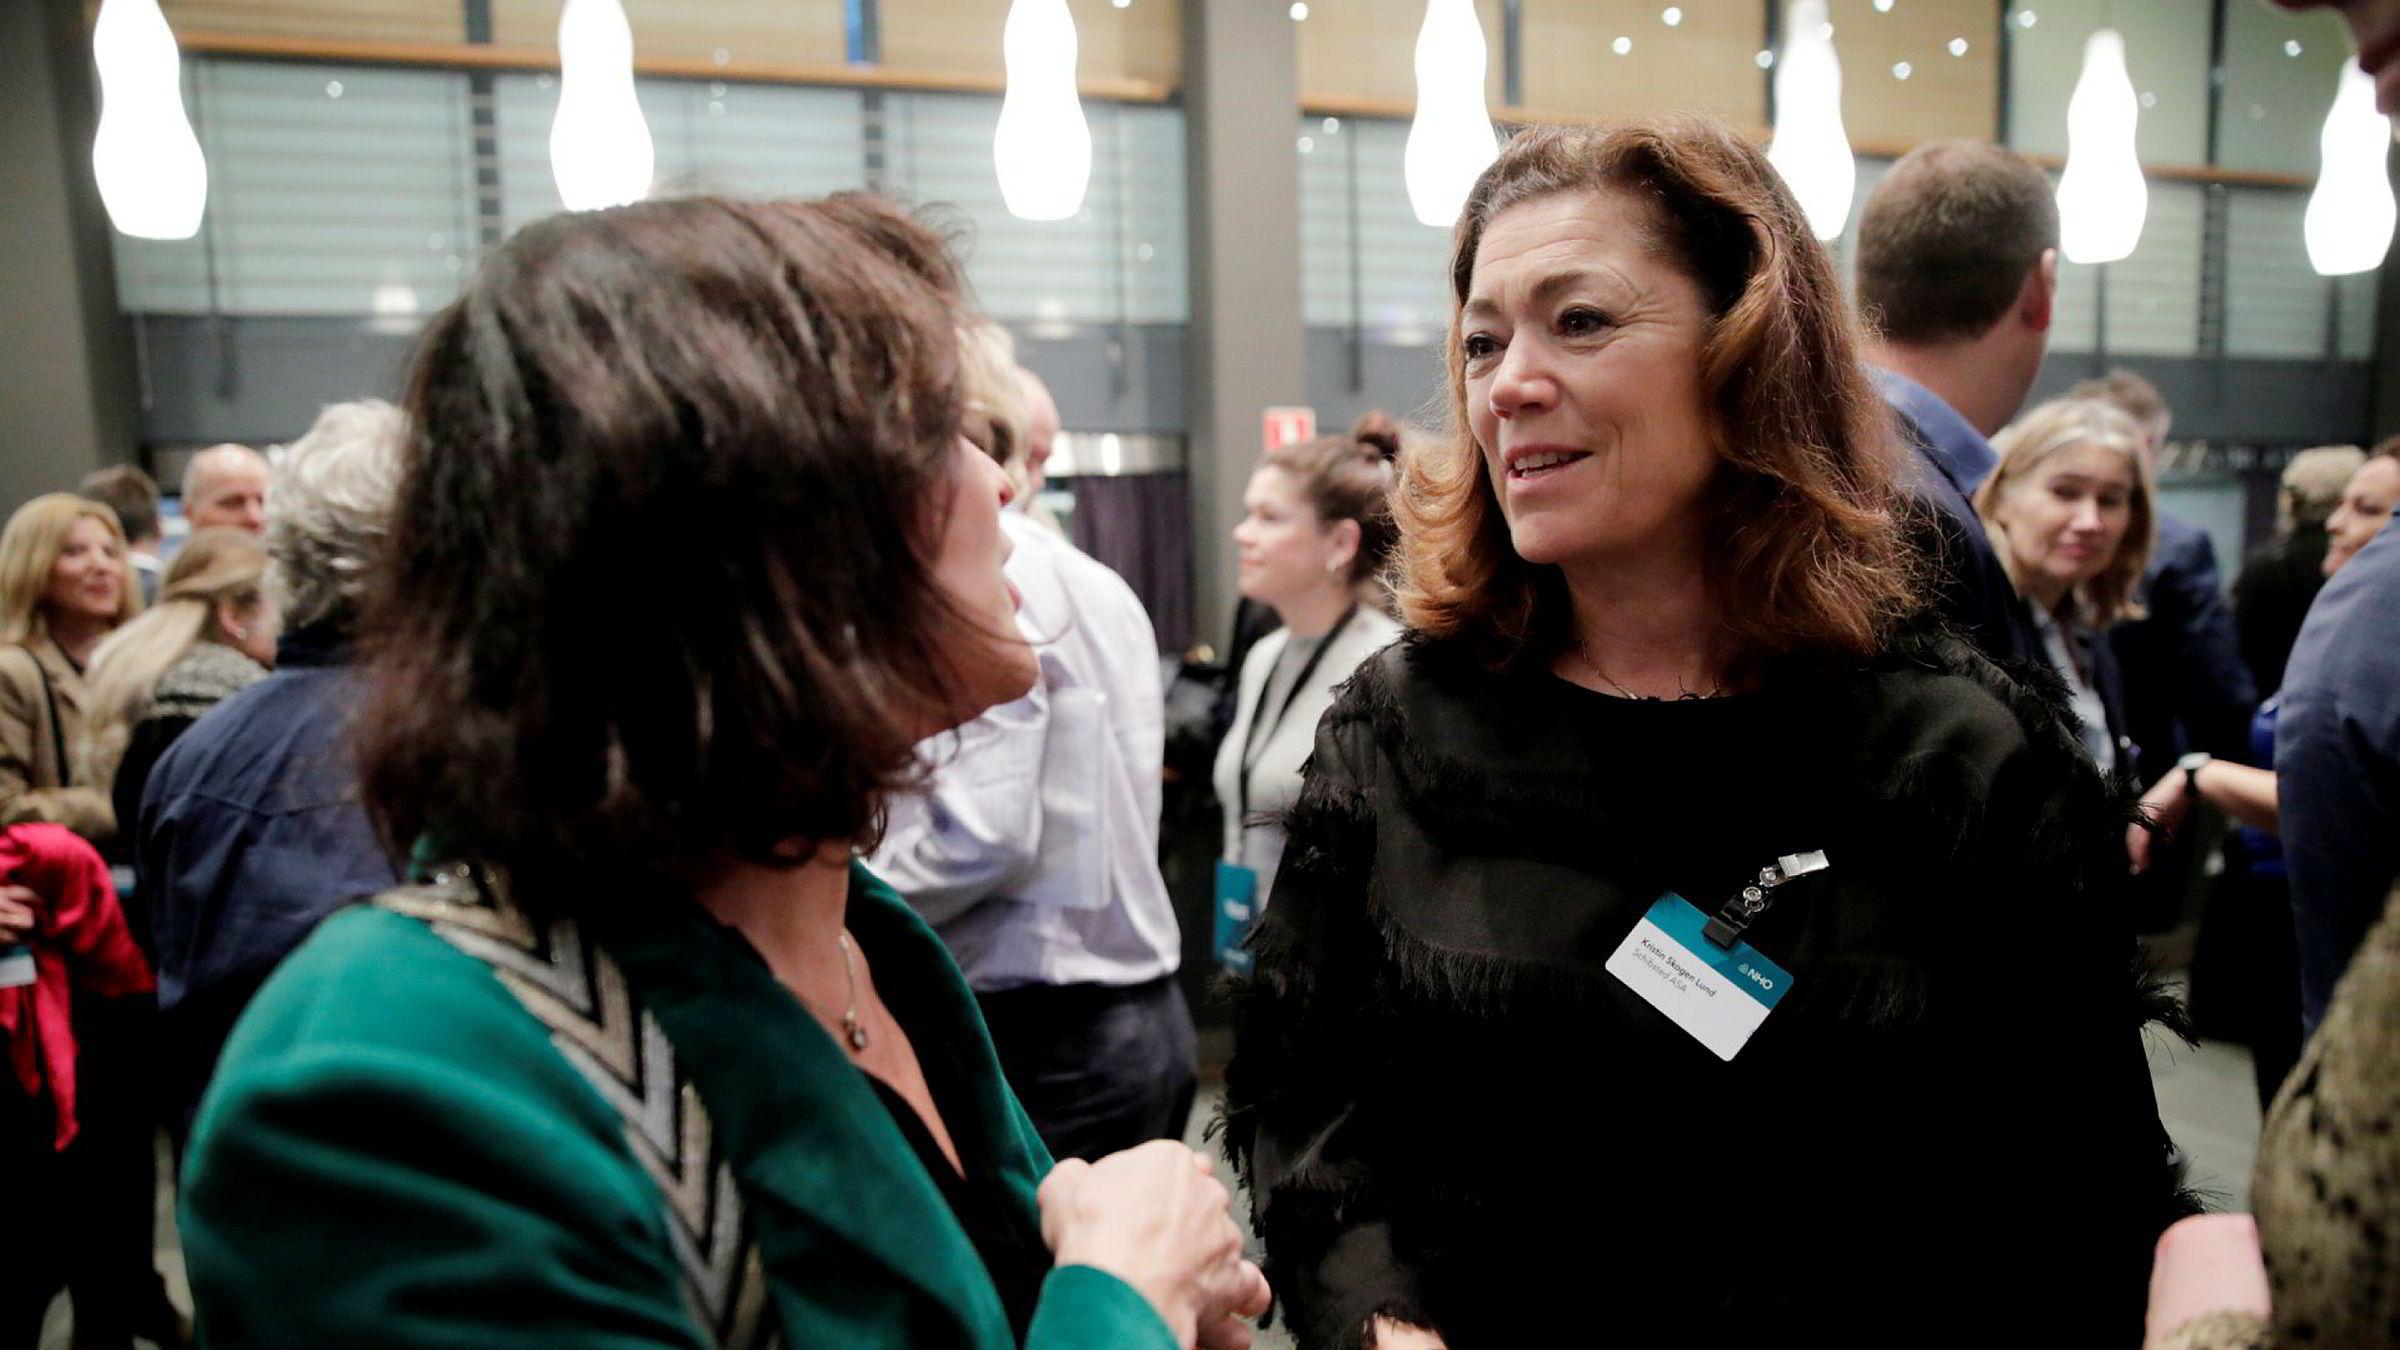 Tidligere NHO-sjef og nåværende toppsjef i Schibsted Kristin Skogen Lund kom tidlig til NHOs årskonferanse i Oslo Spektrum onsdag.